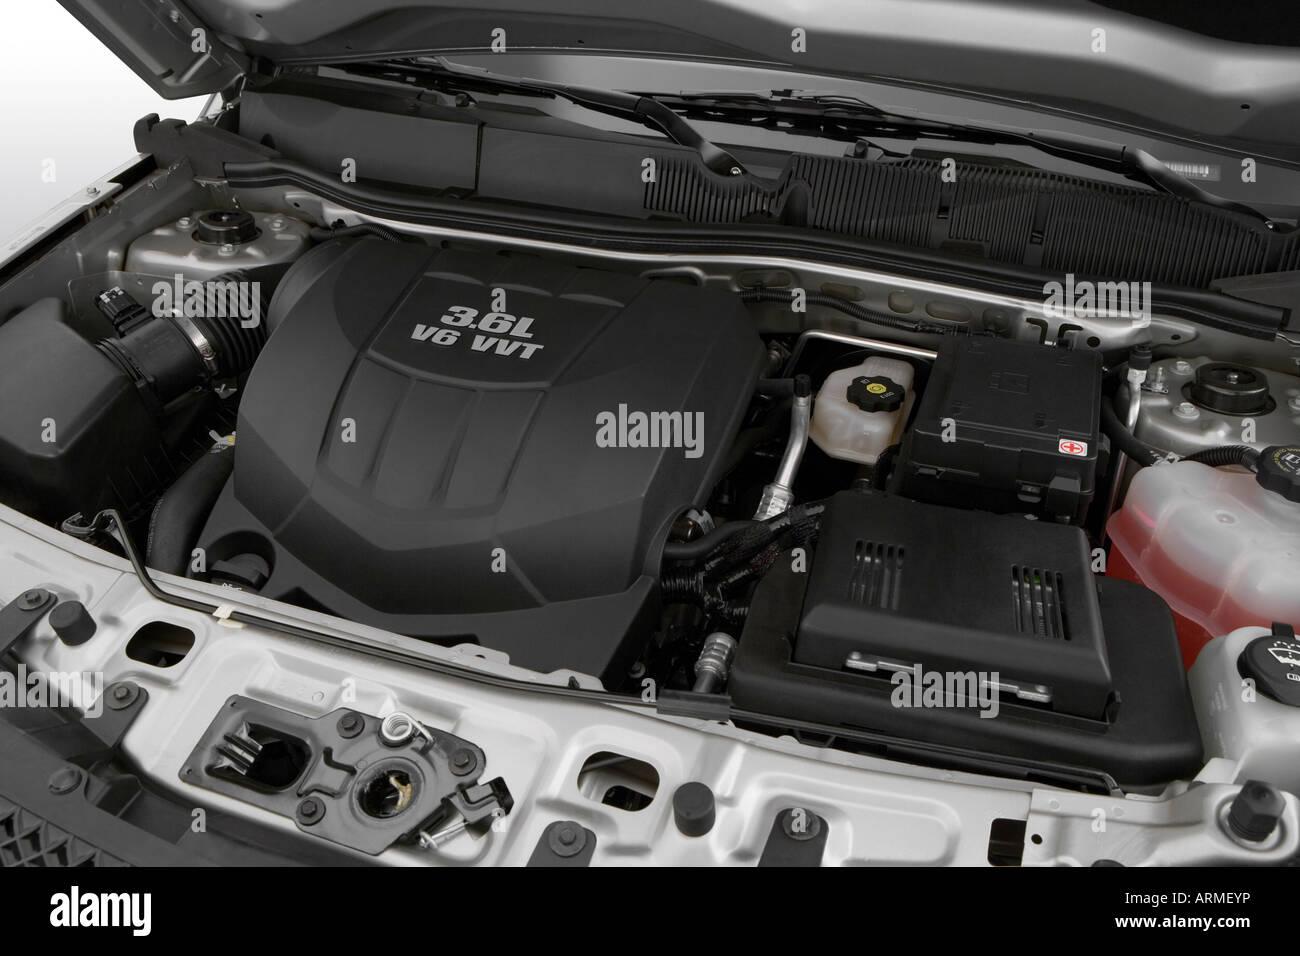 2008 Chevrolet Equinox Sport In Silver Engine Stock Photo